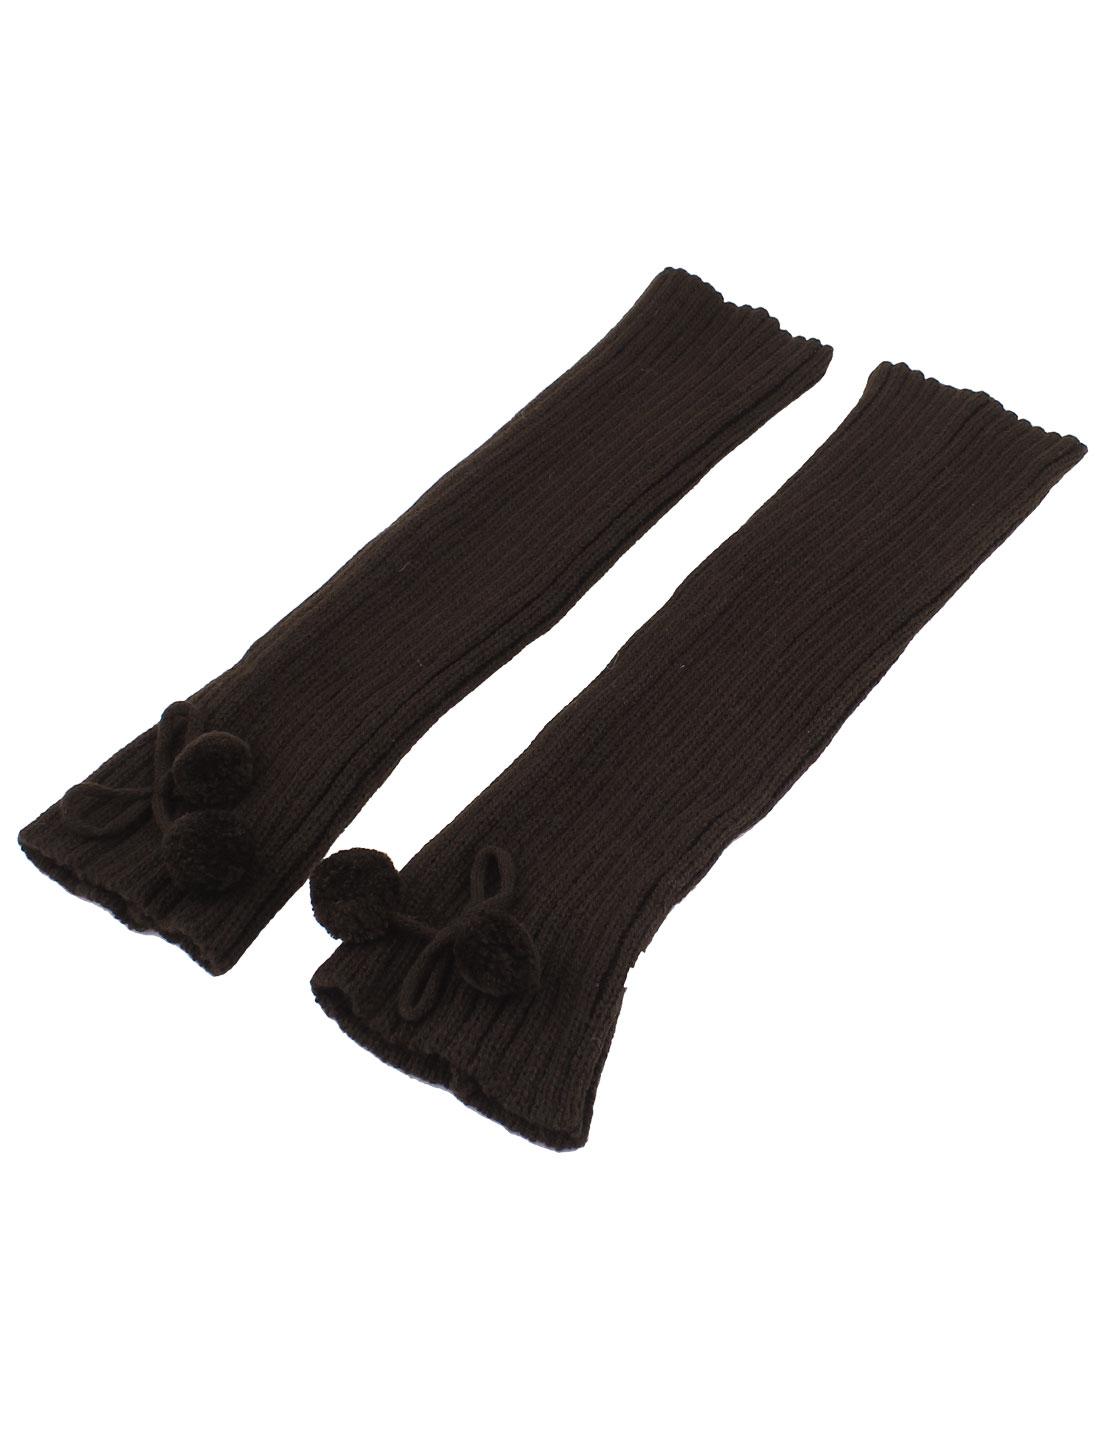 Woman Pom Pom Decor Ribbed Stretchy Leg Warmers Leggings Socks Brown Pair